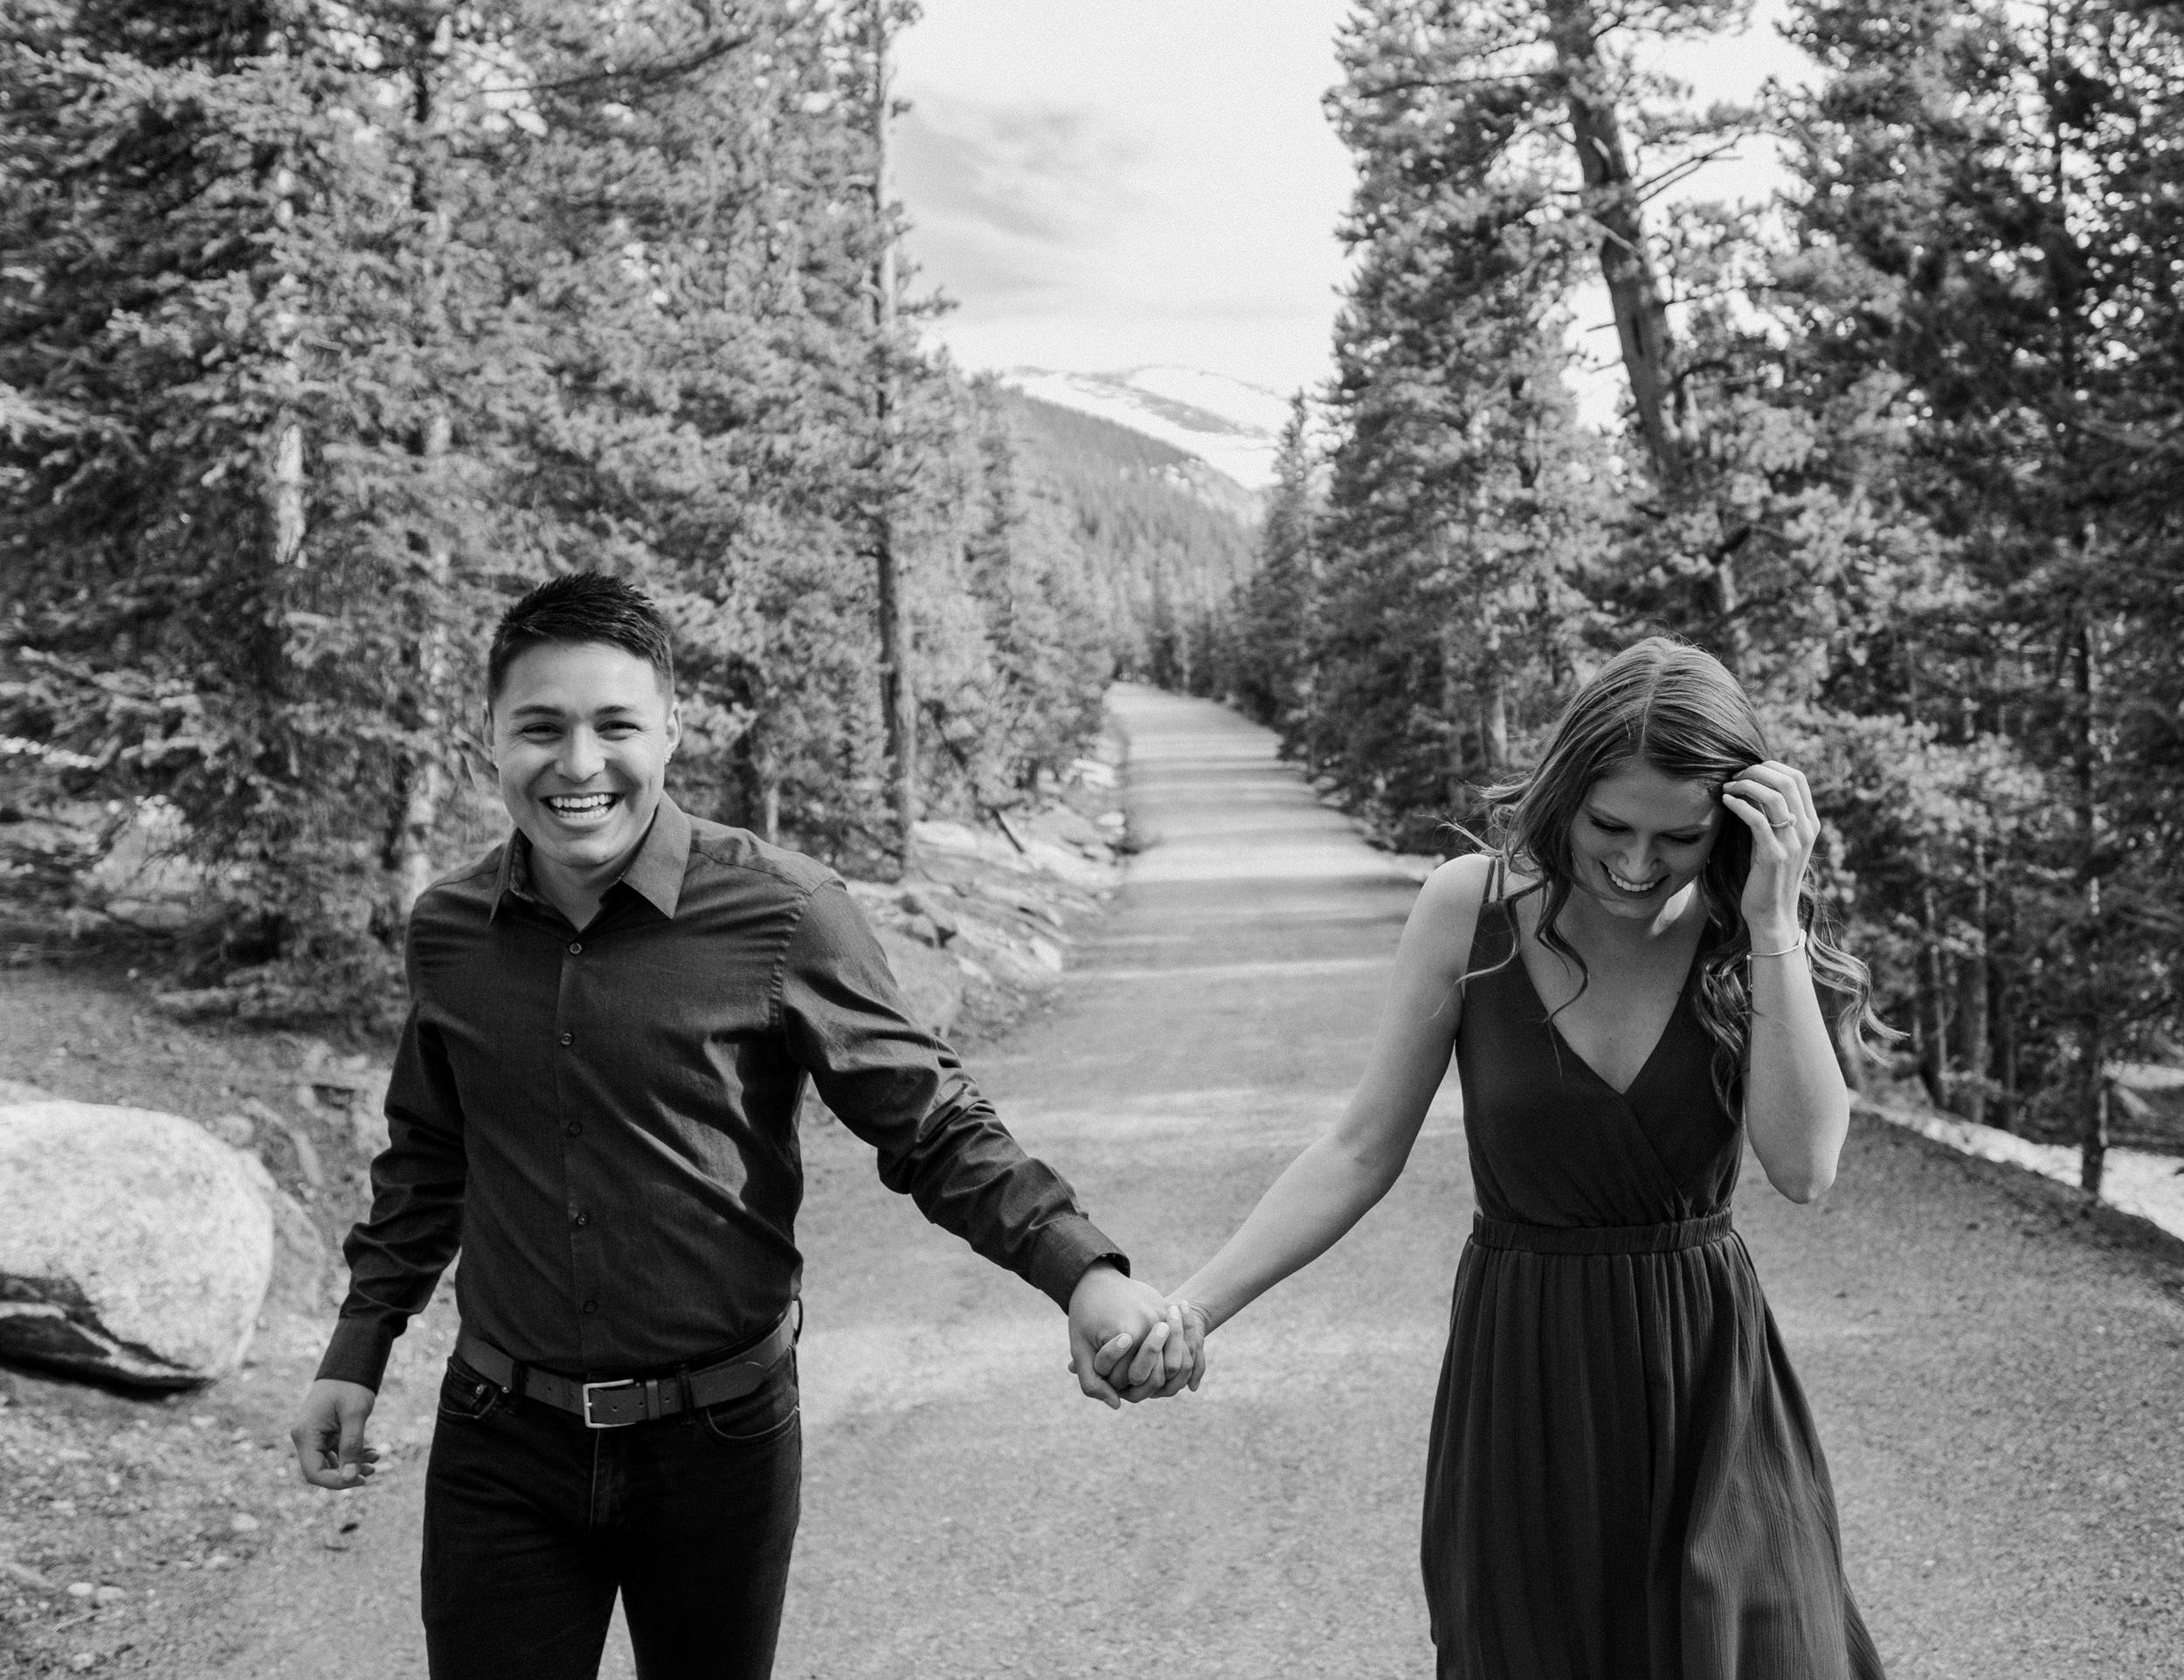 Colorado engagement photos. Echo Lake engagement session. Mt. Evans engagement photos. Colorado wedding photographer. Colorado mountain engagement photography.